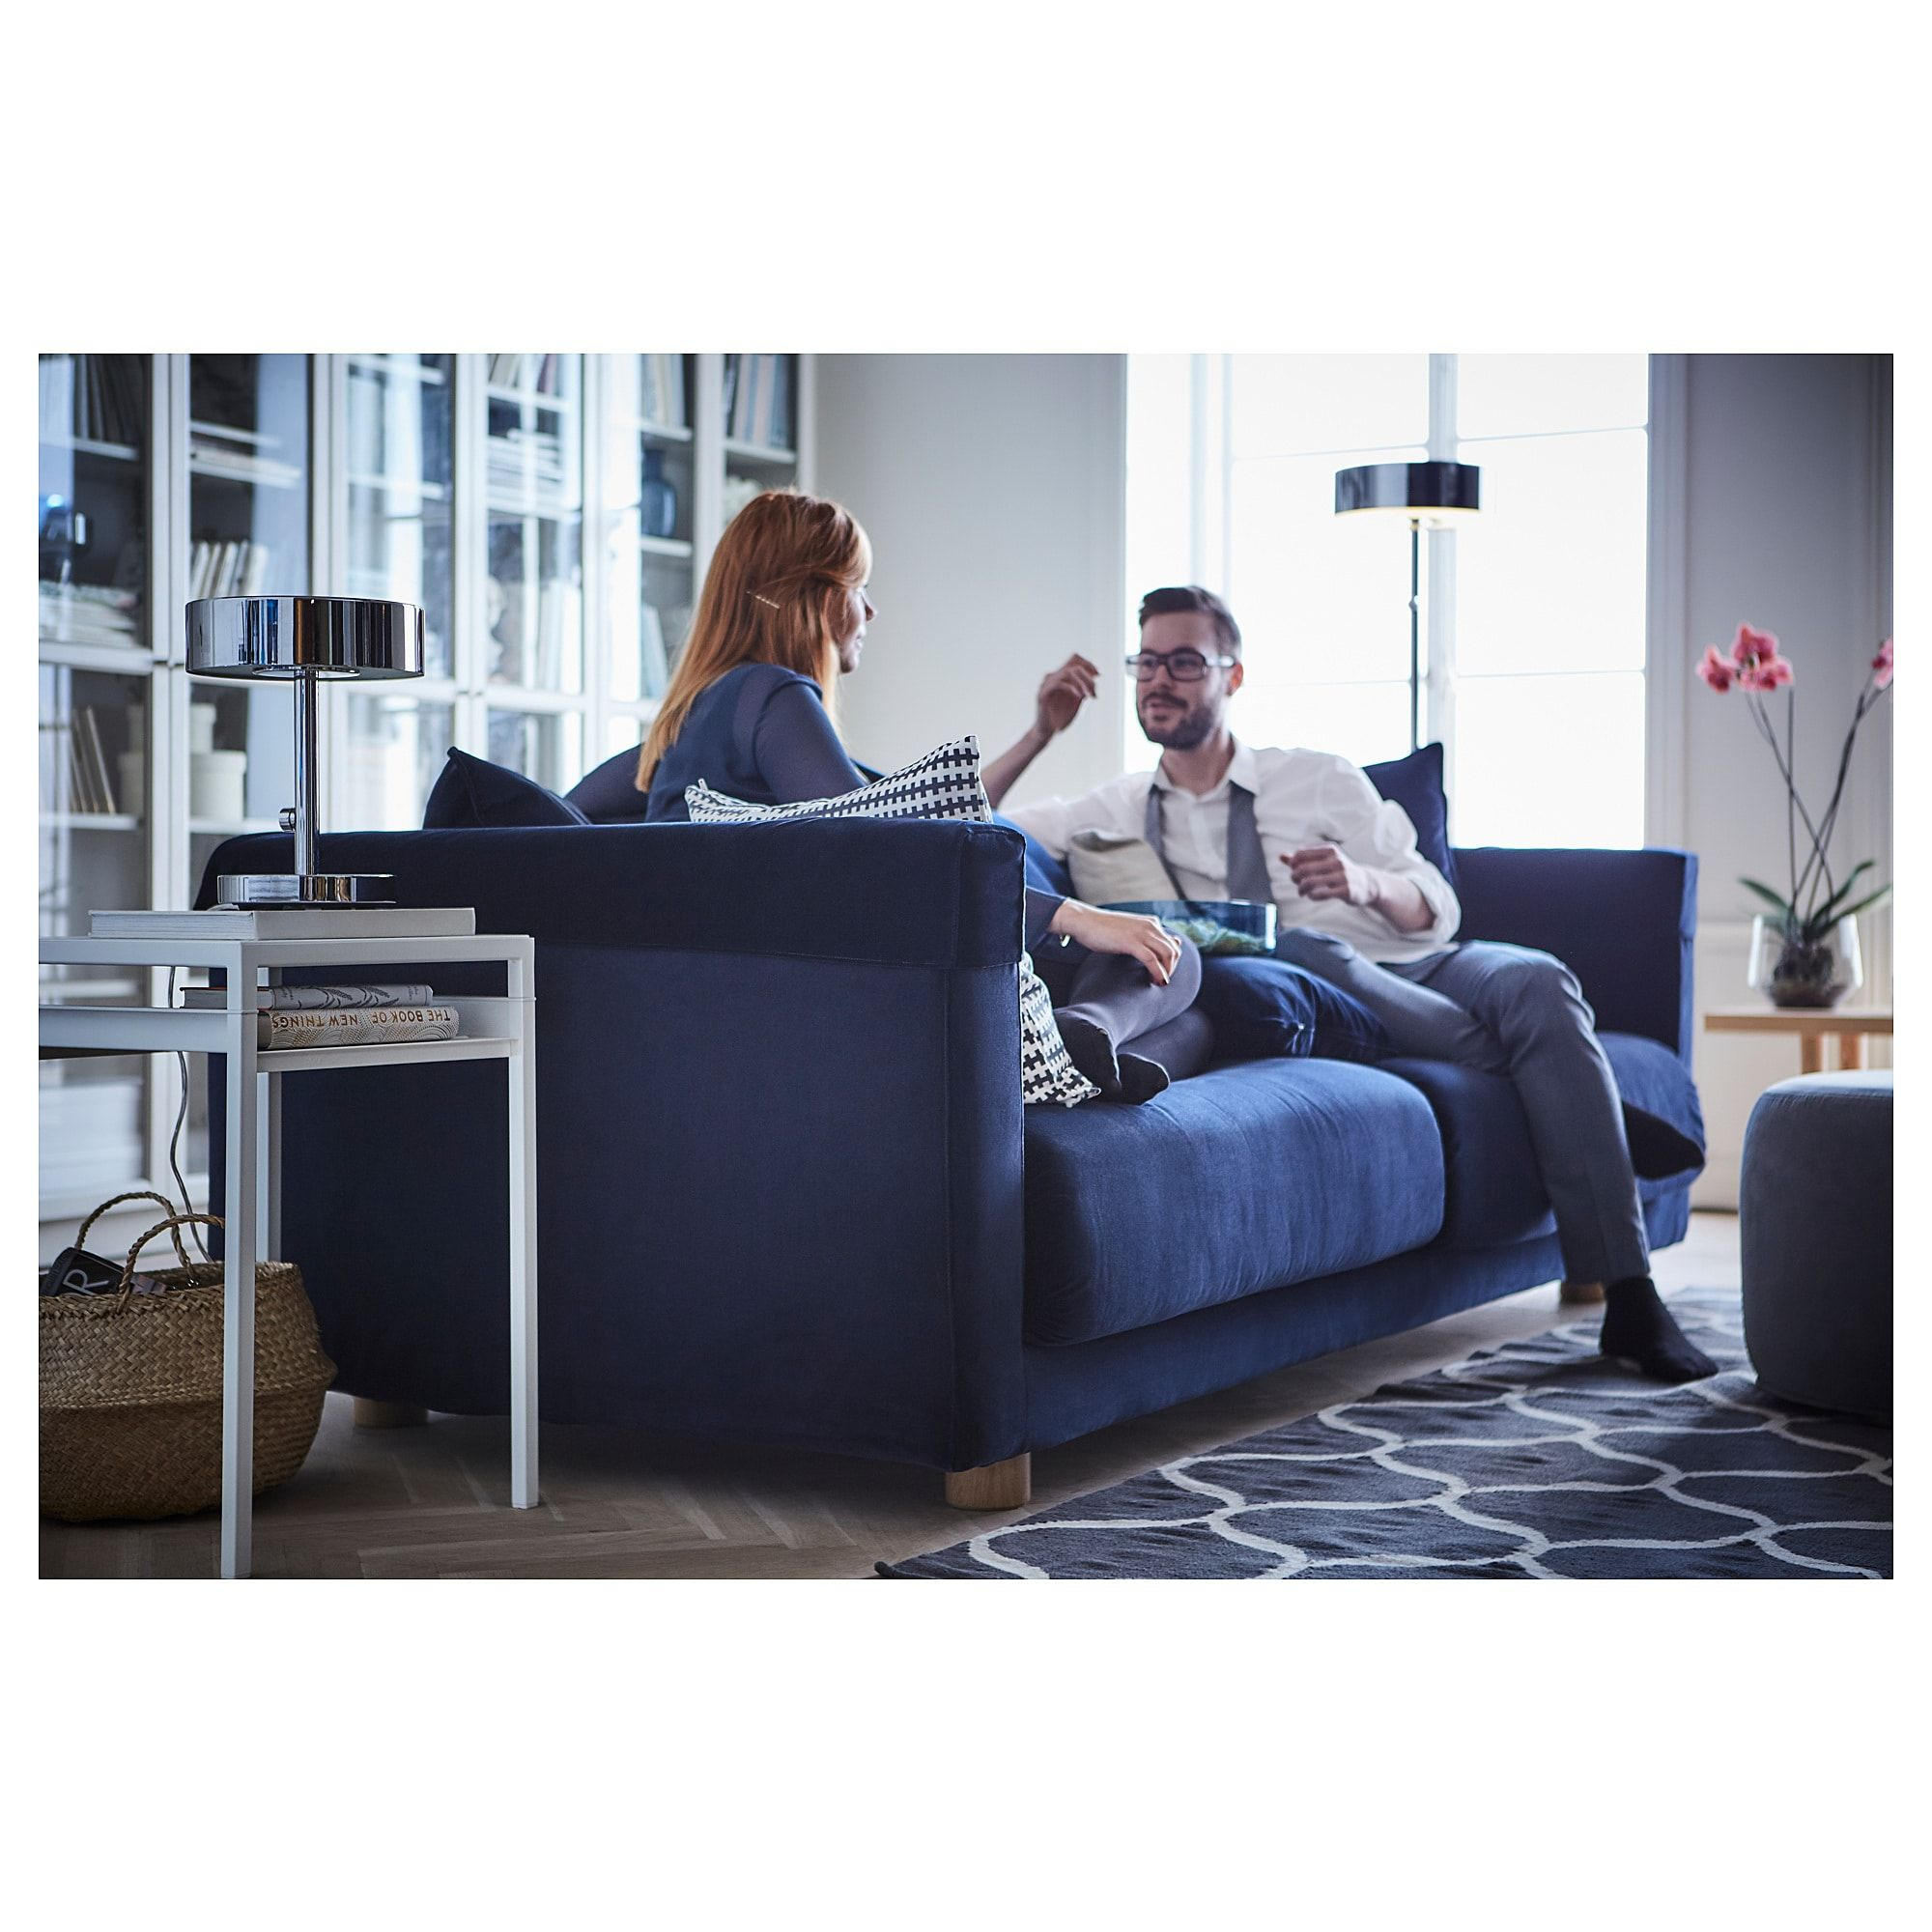 Divano Velluto Blu Ikea stockholm 2017 sofa - sandbacka dark blue (with images